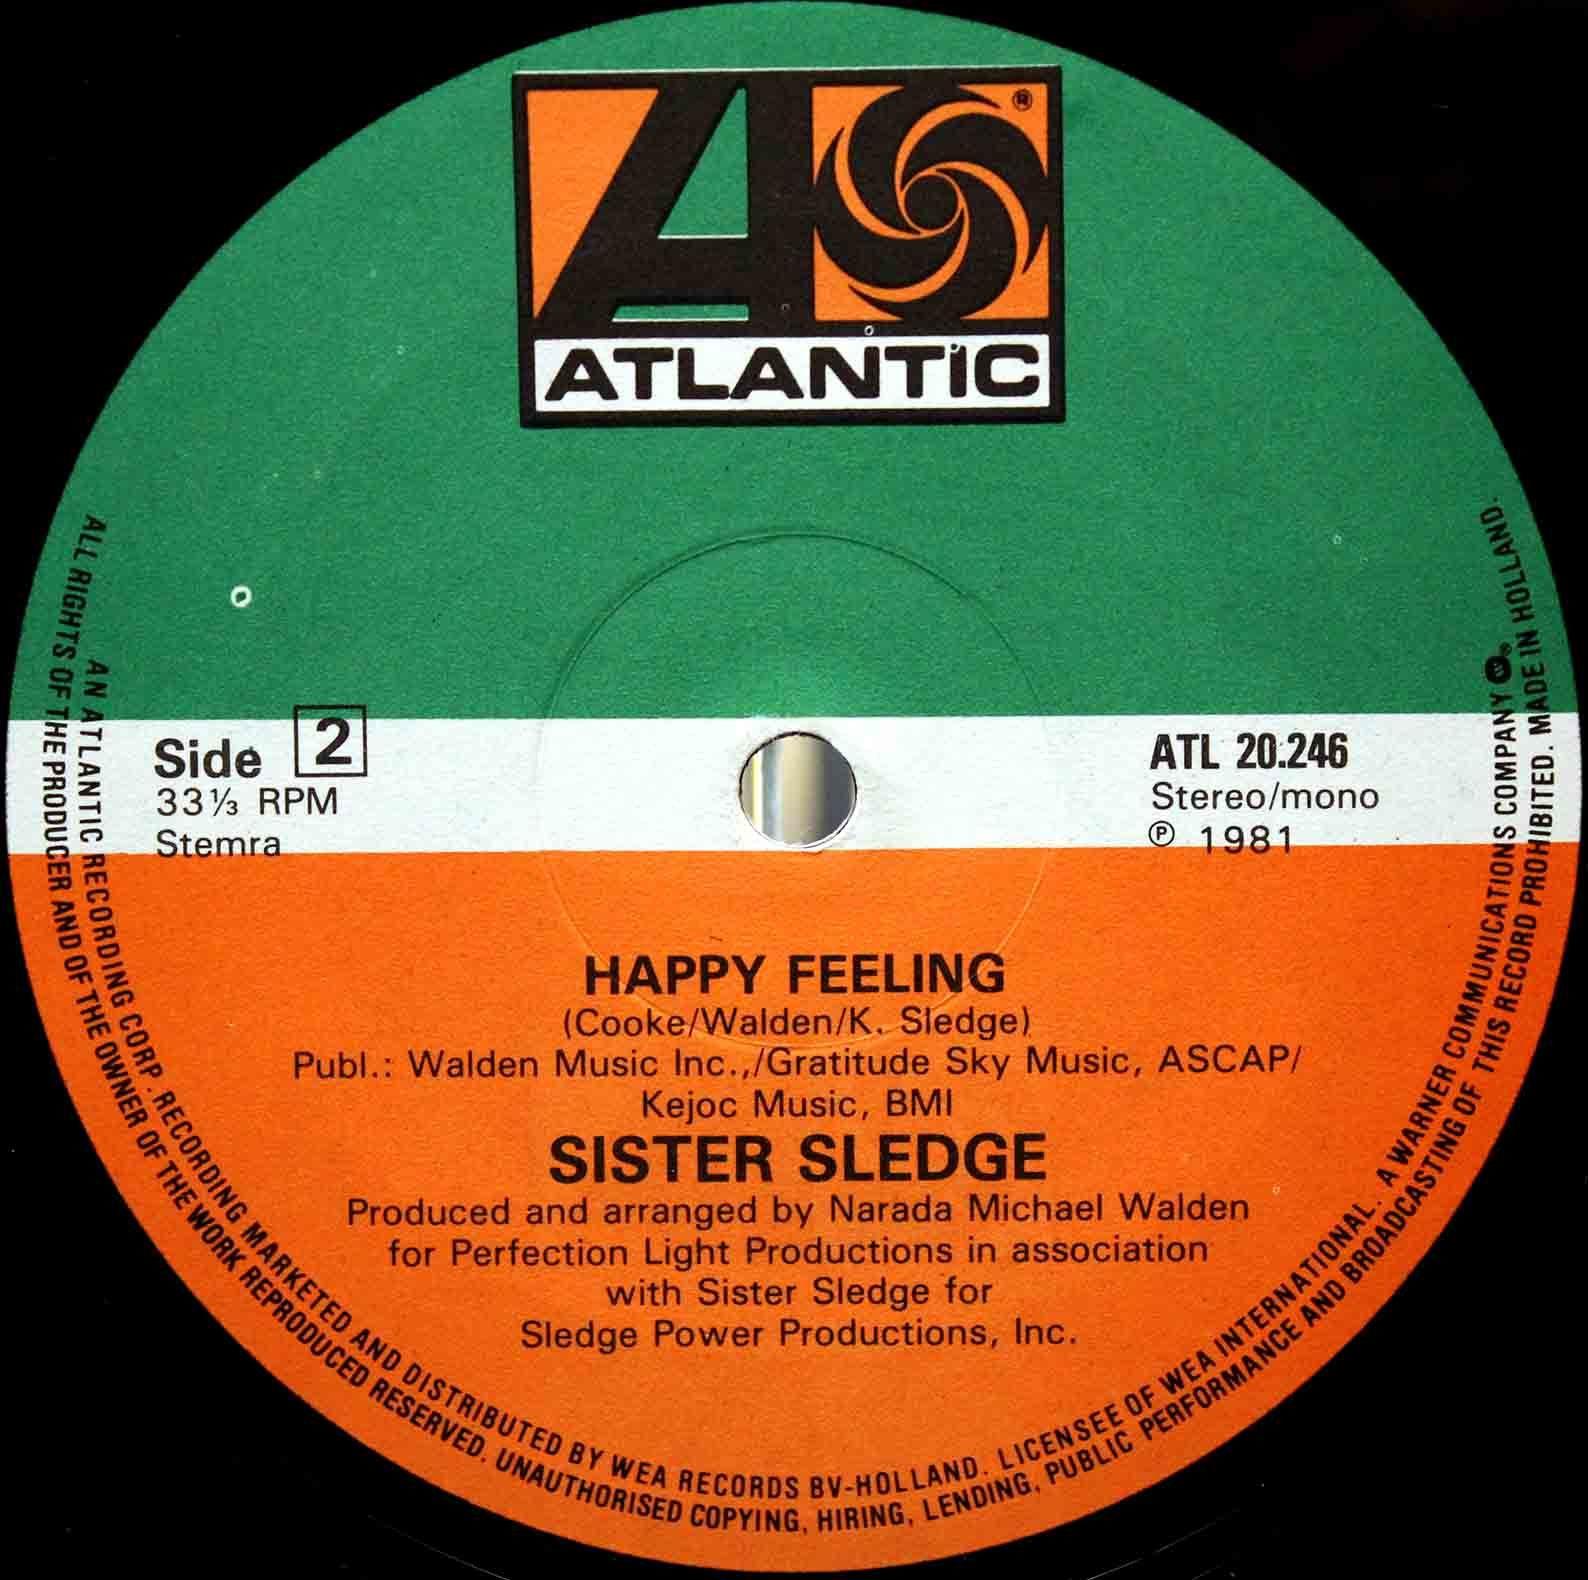 Sister Sledge – All American Girls 03